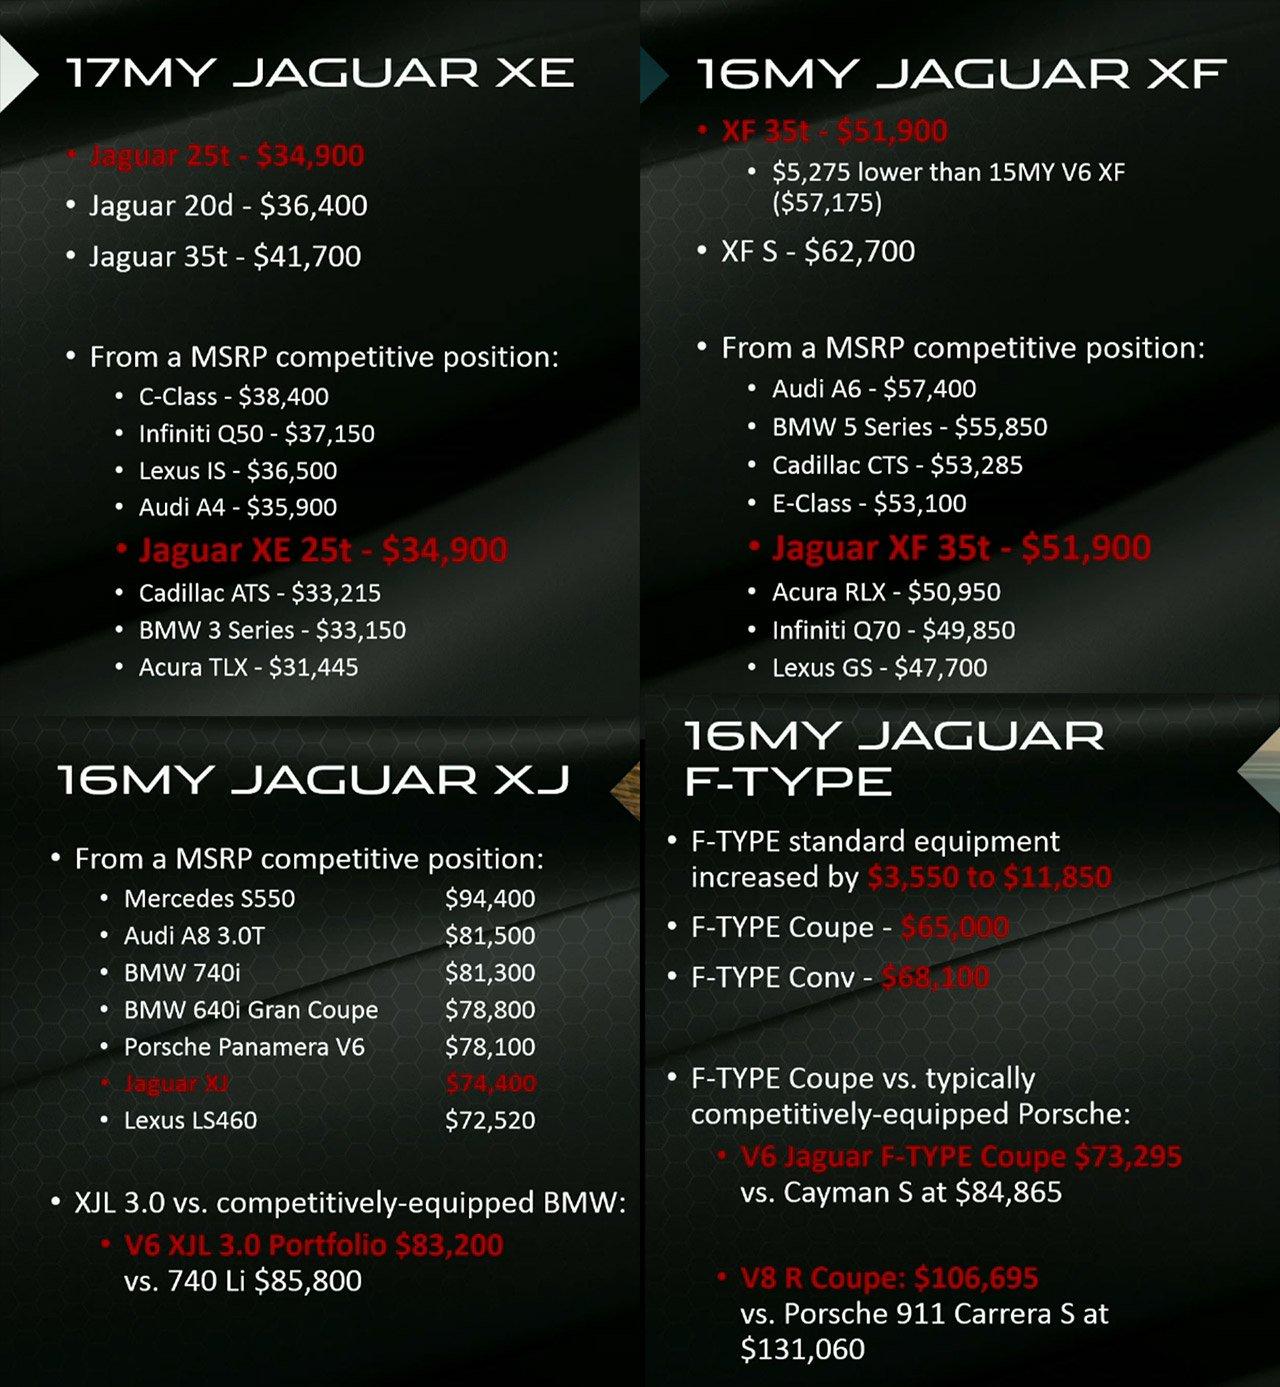 2016_jaguar_strategy_3